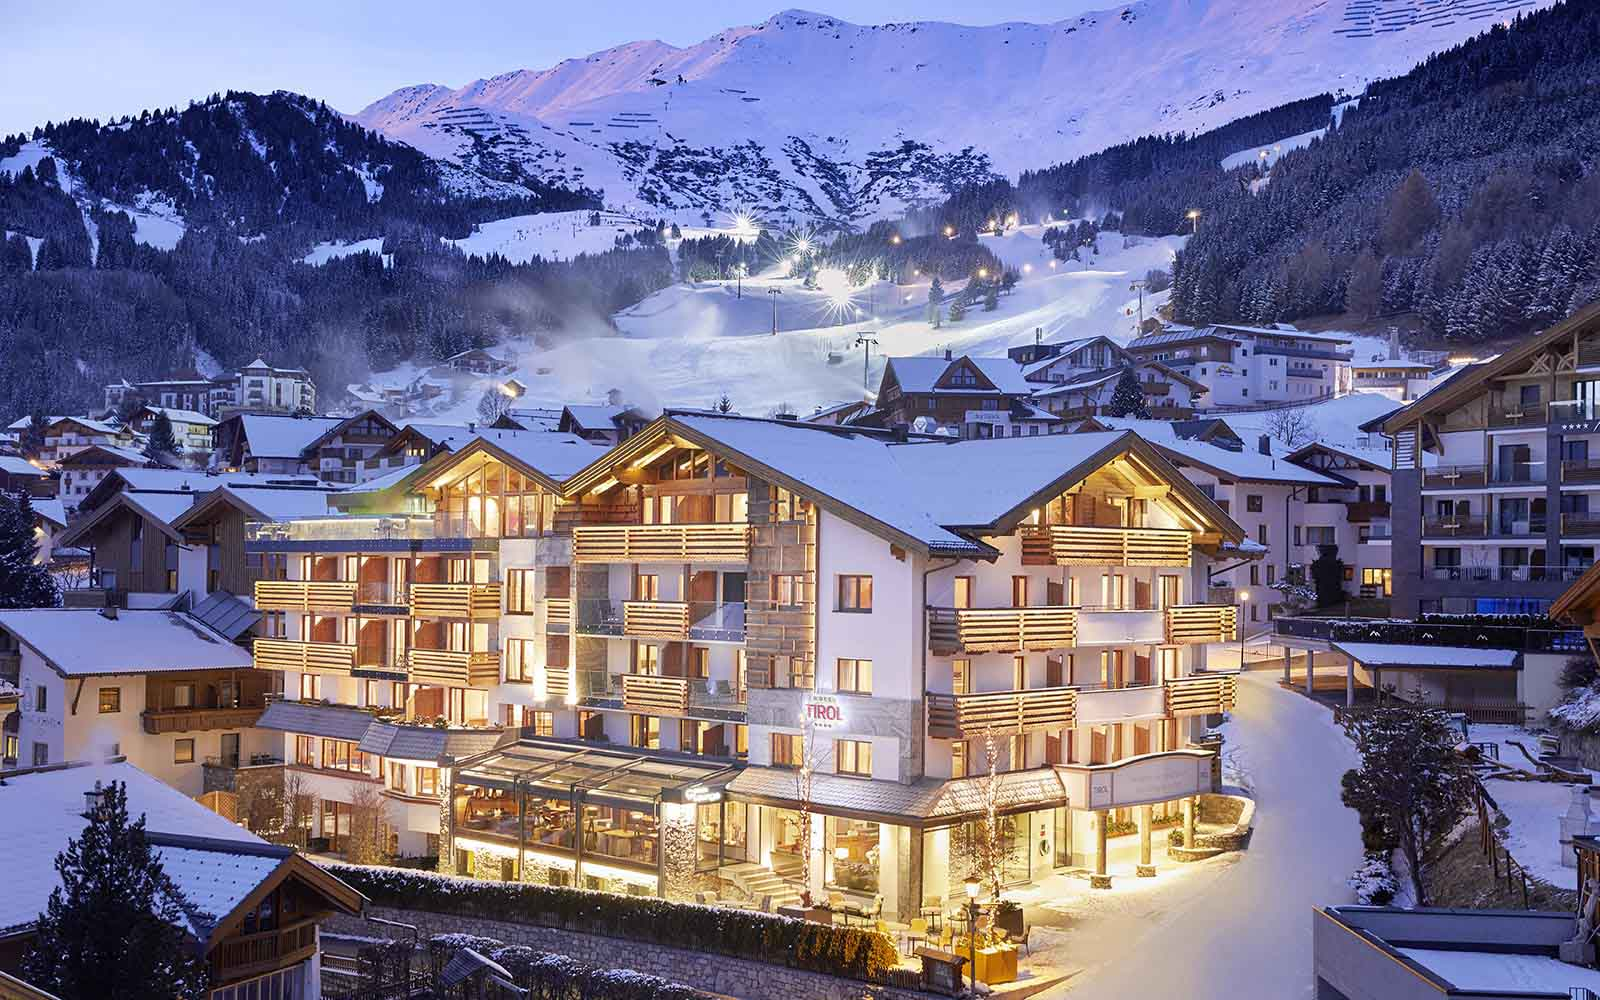 Hotel Tirol Fiss Serfaus-Ladis-Fiss Tyrol Austria Lifestyle-Hotel Winter Holidays Skiing Winter Hotel Outdoor